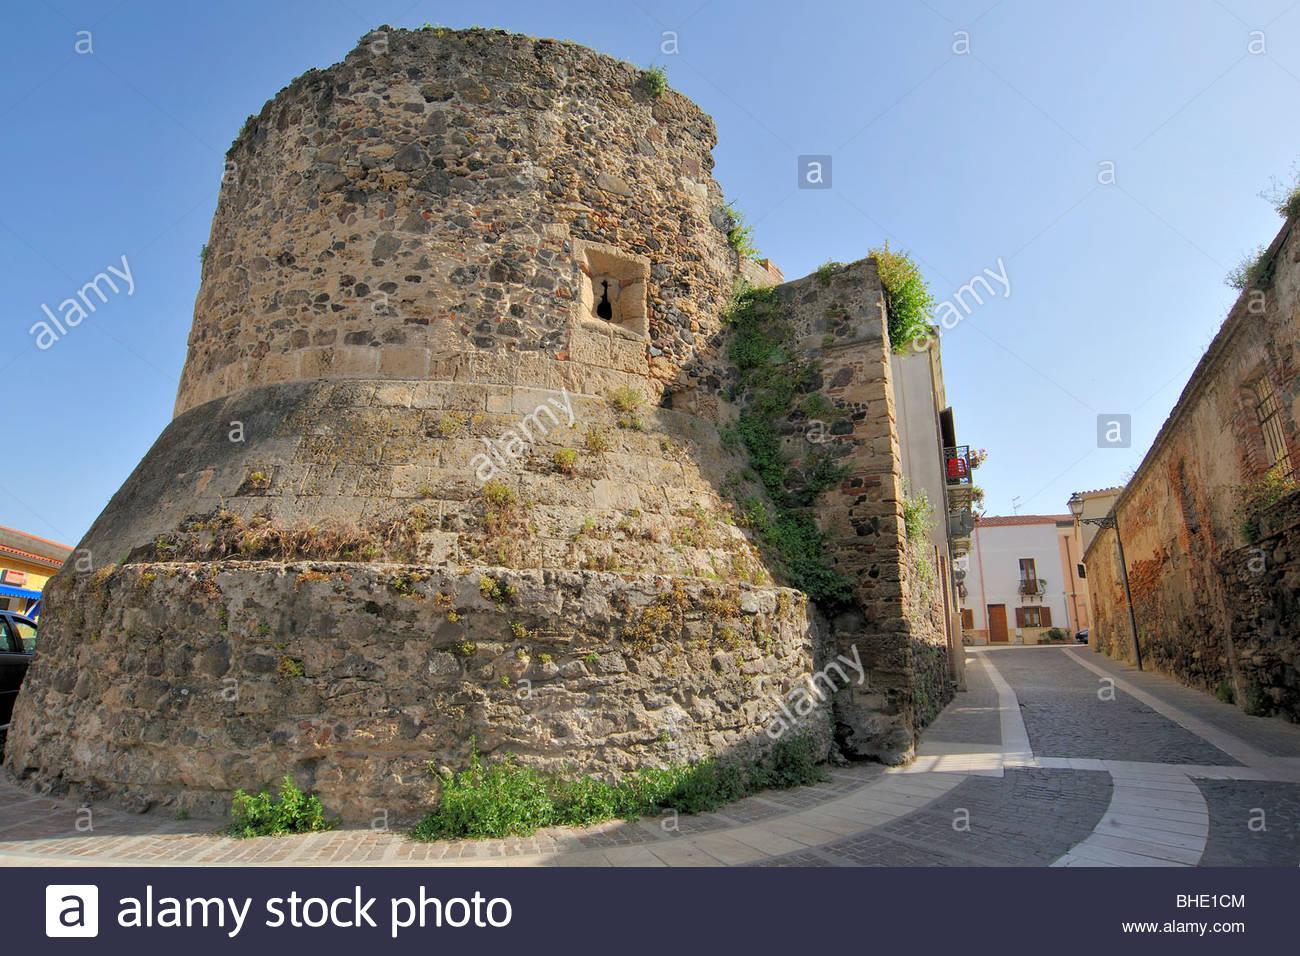 De portixedda toer, Oristano, Cerdeña, Italia Foto de stock